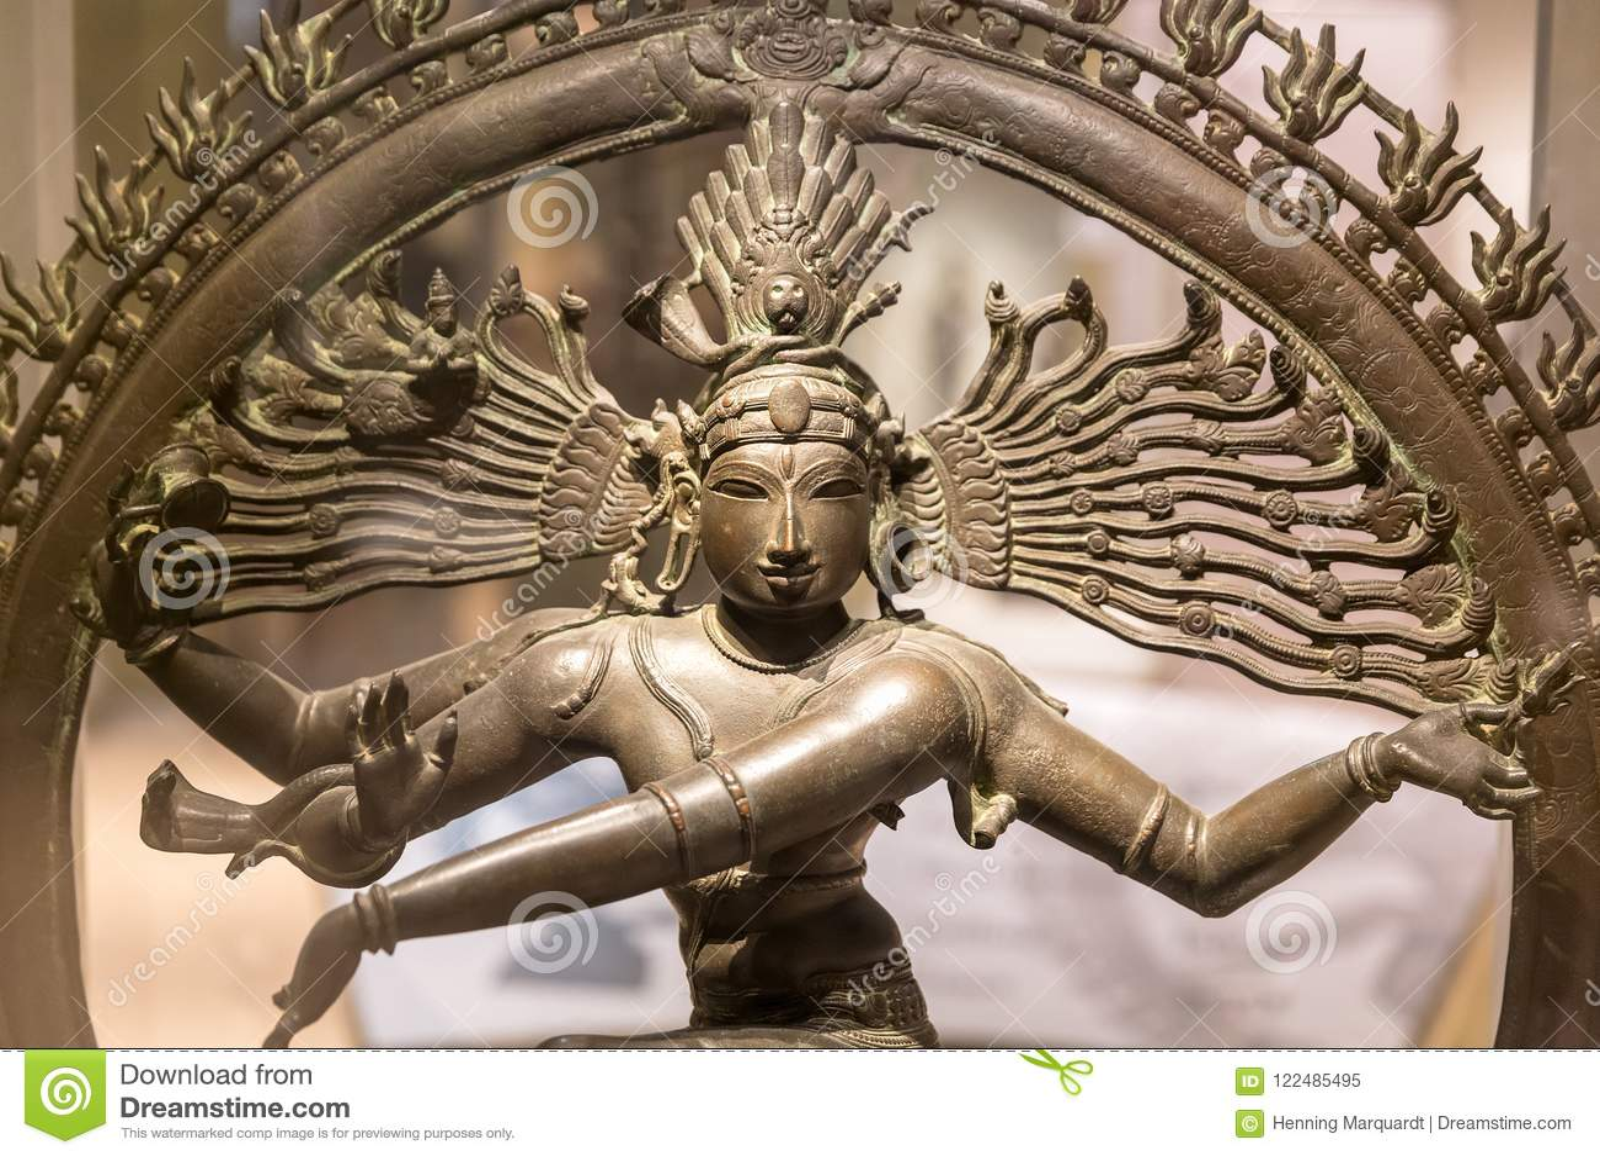 Rzeźba Nataraja, władyka taniec, New Delhi, India